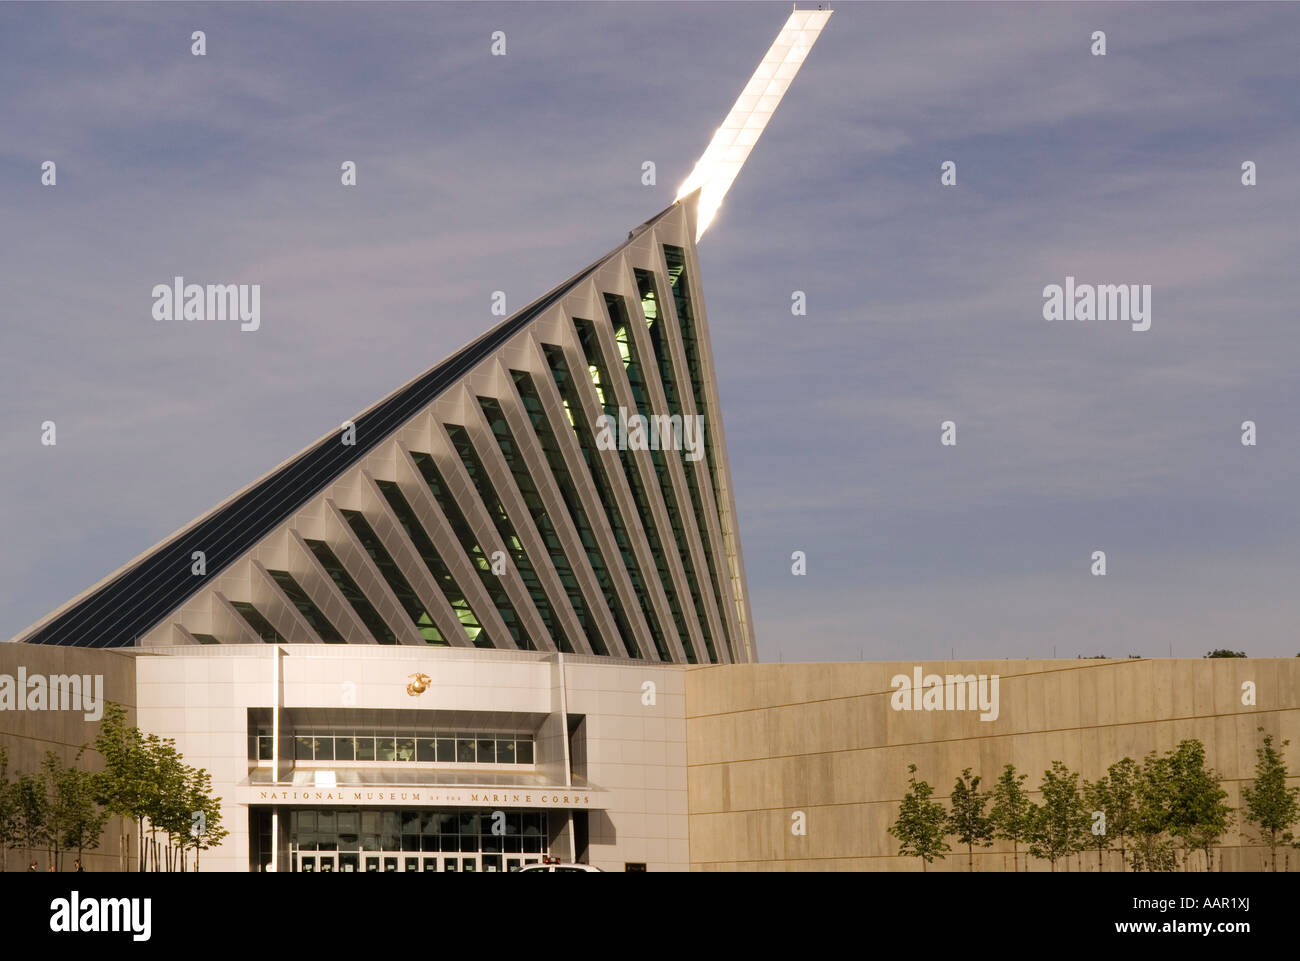 National Museum of the Marine Corps Washington DC USA Stock Photo